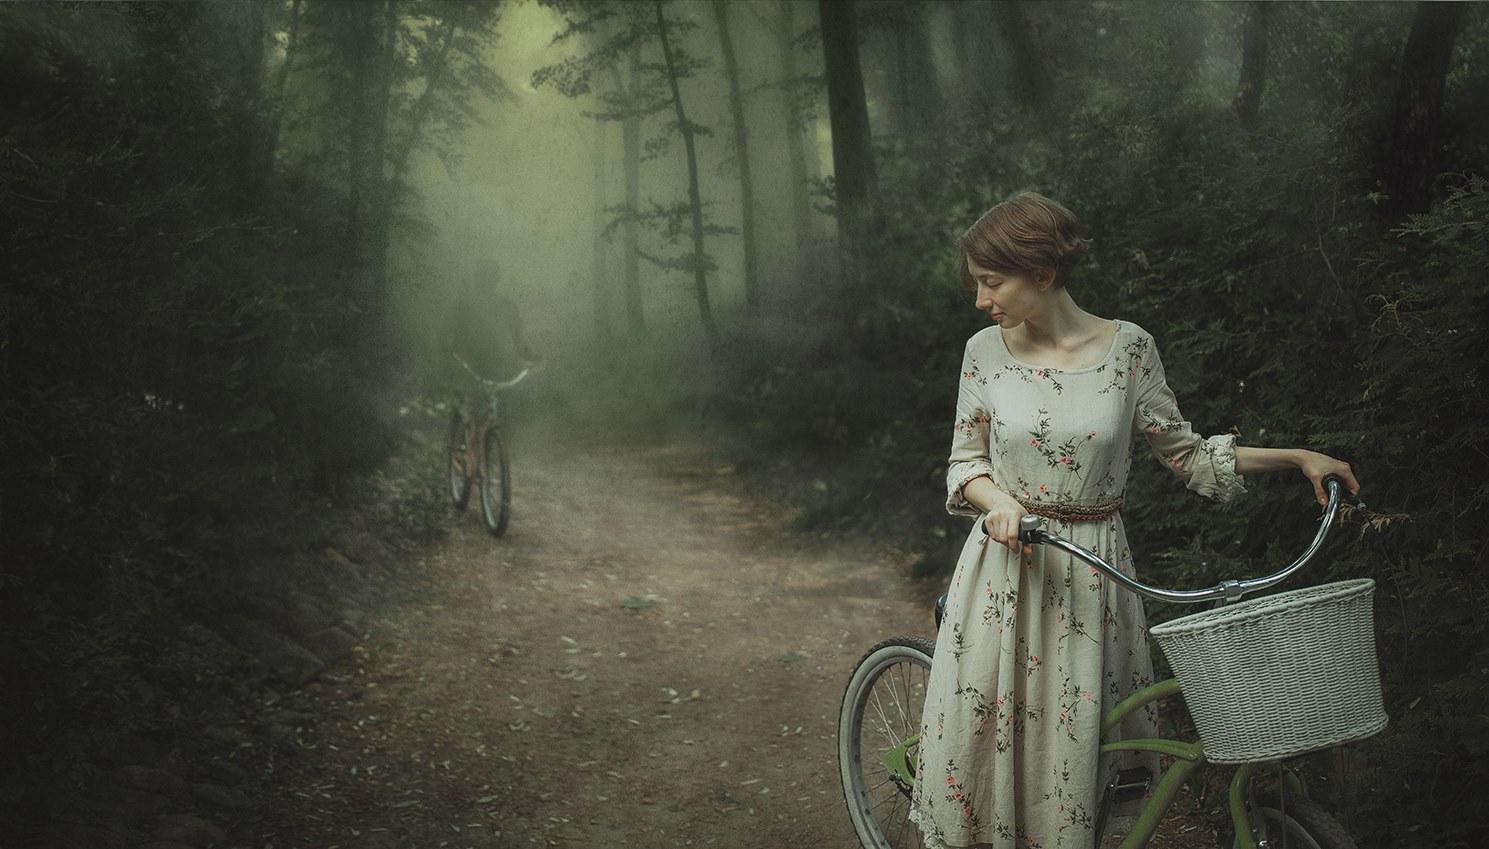 Cyclistes en forêt © Dmitry Rogozhkin